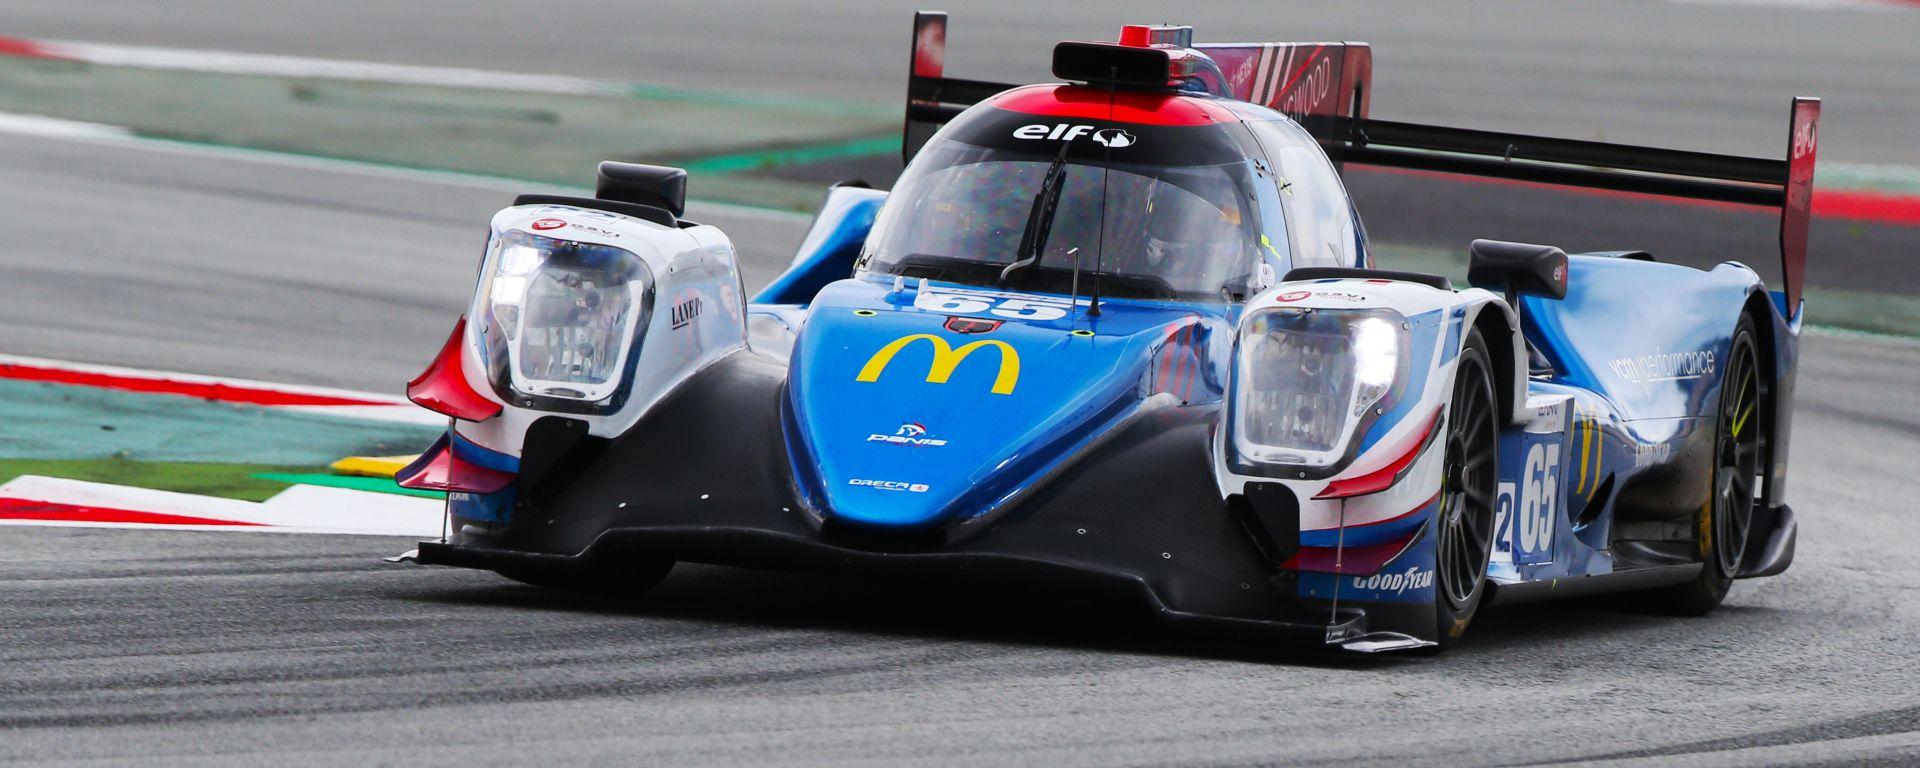 panis racing